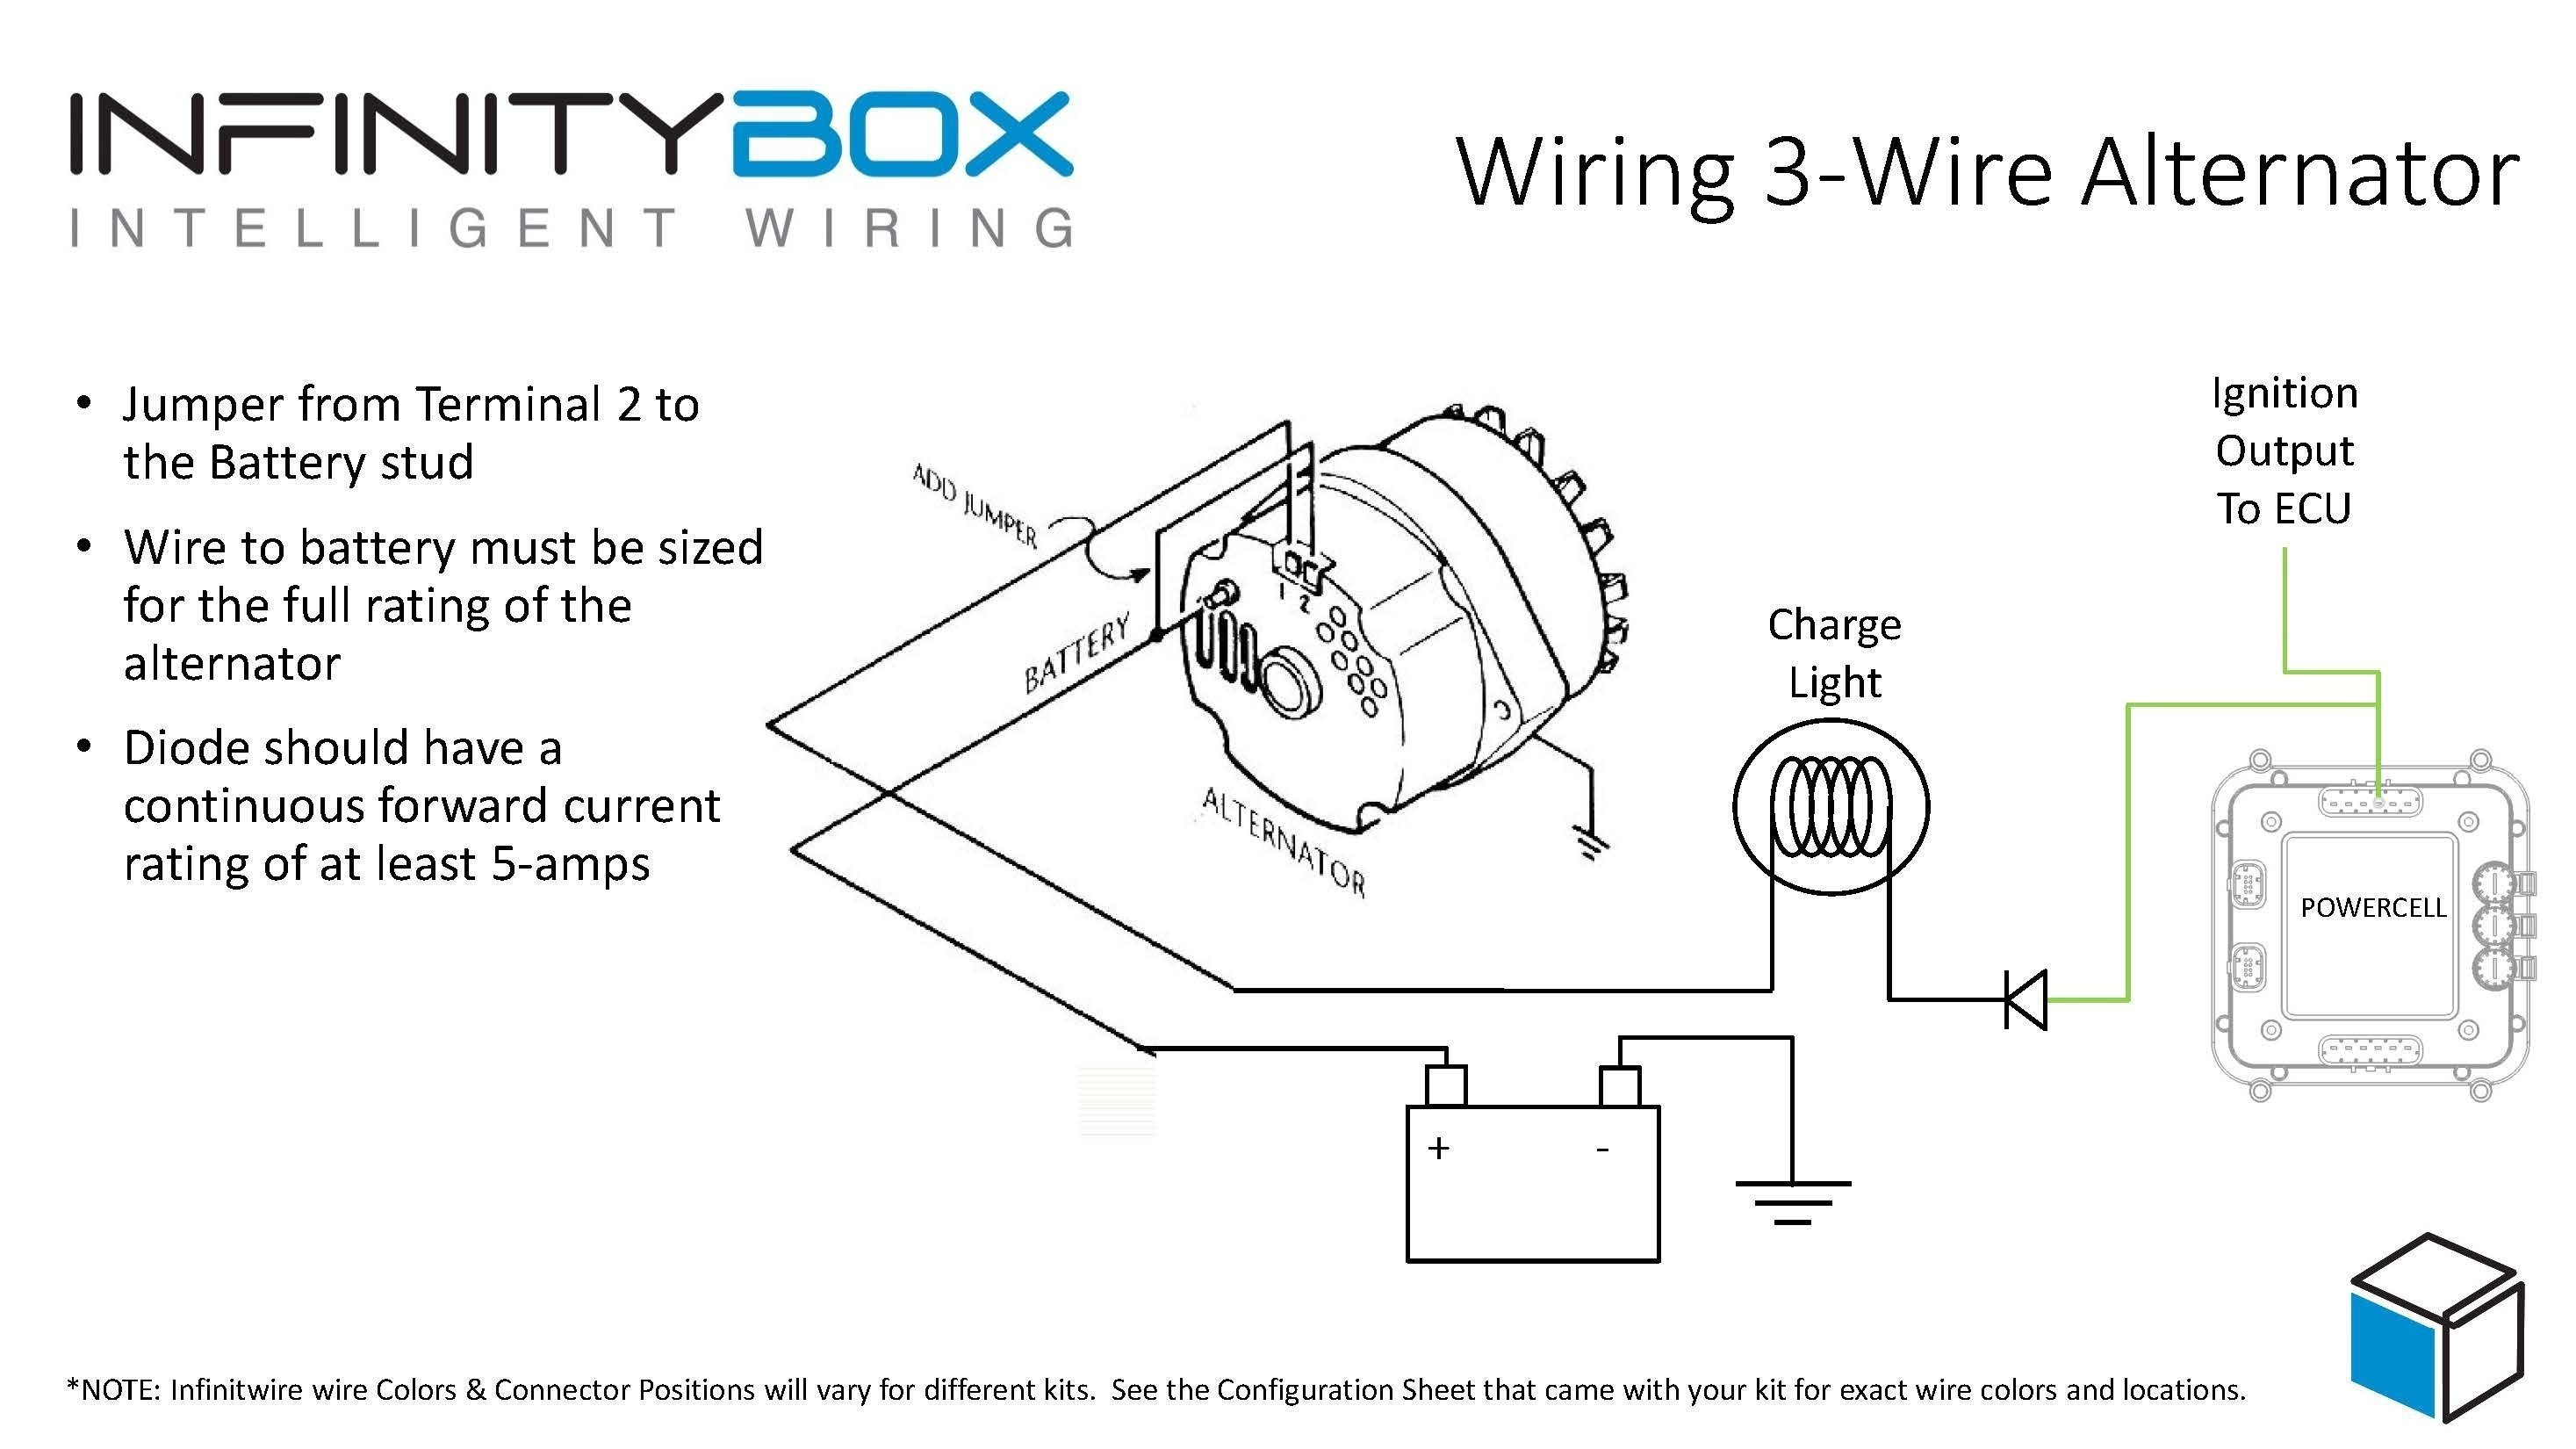 Gm Alternator Wiring Diagram Inspirational 2 Wire Alternator Wiring Diagram Awesome 3 Wire Alternator Wiring